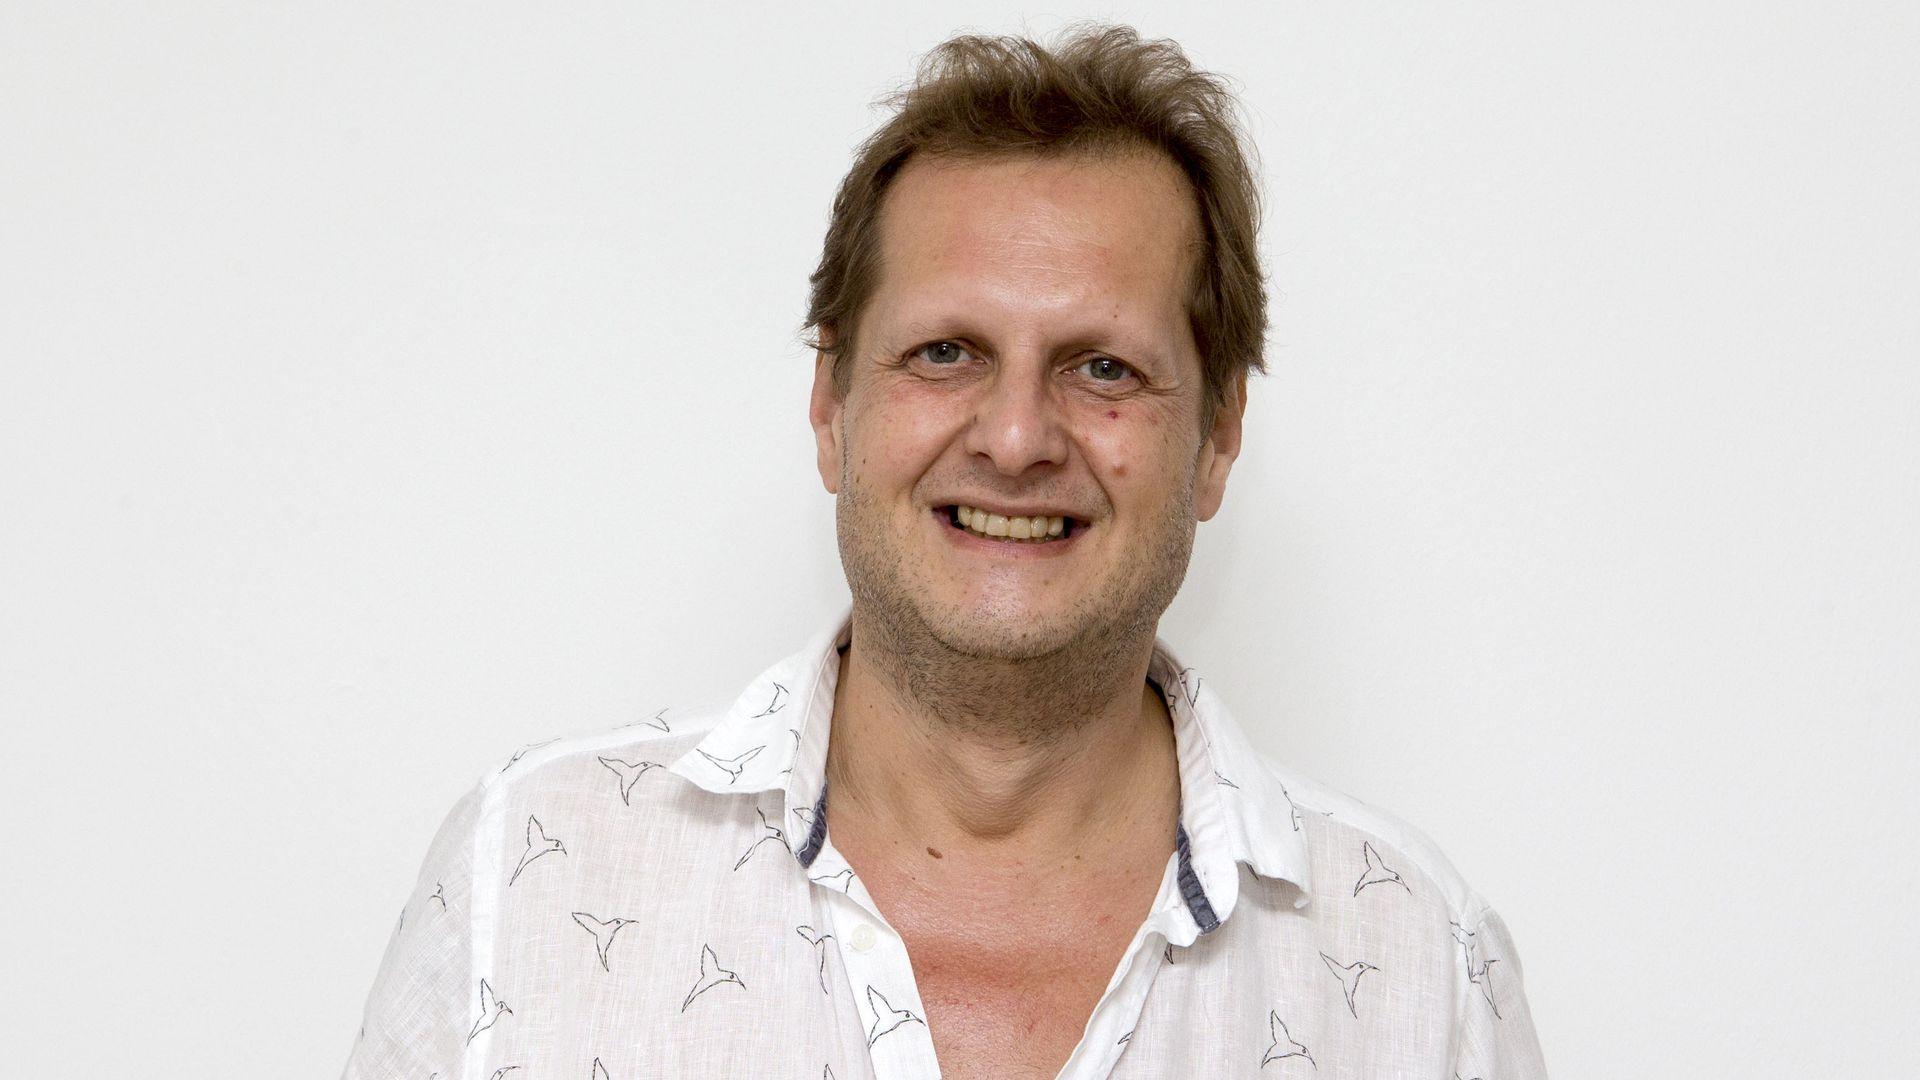 Jens Büchner Krankheit